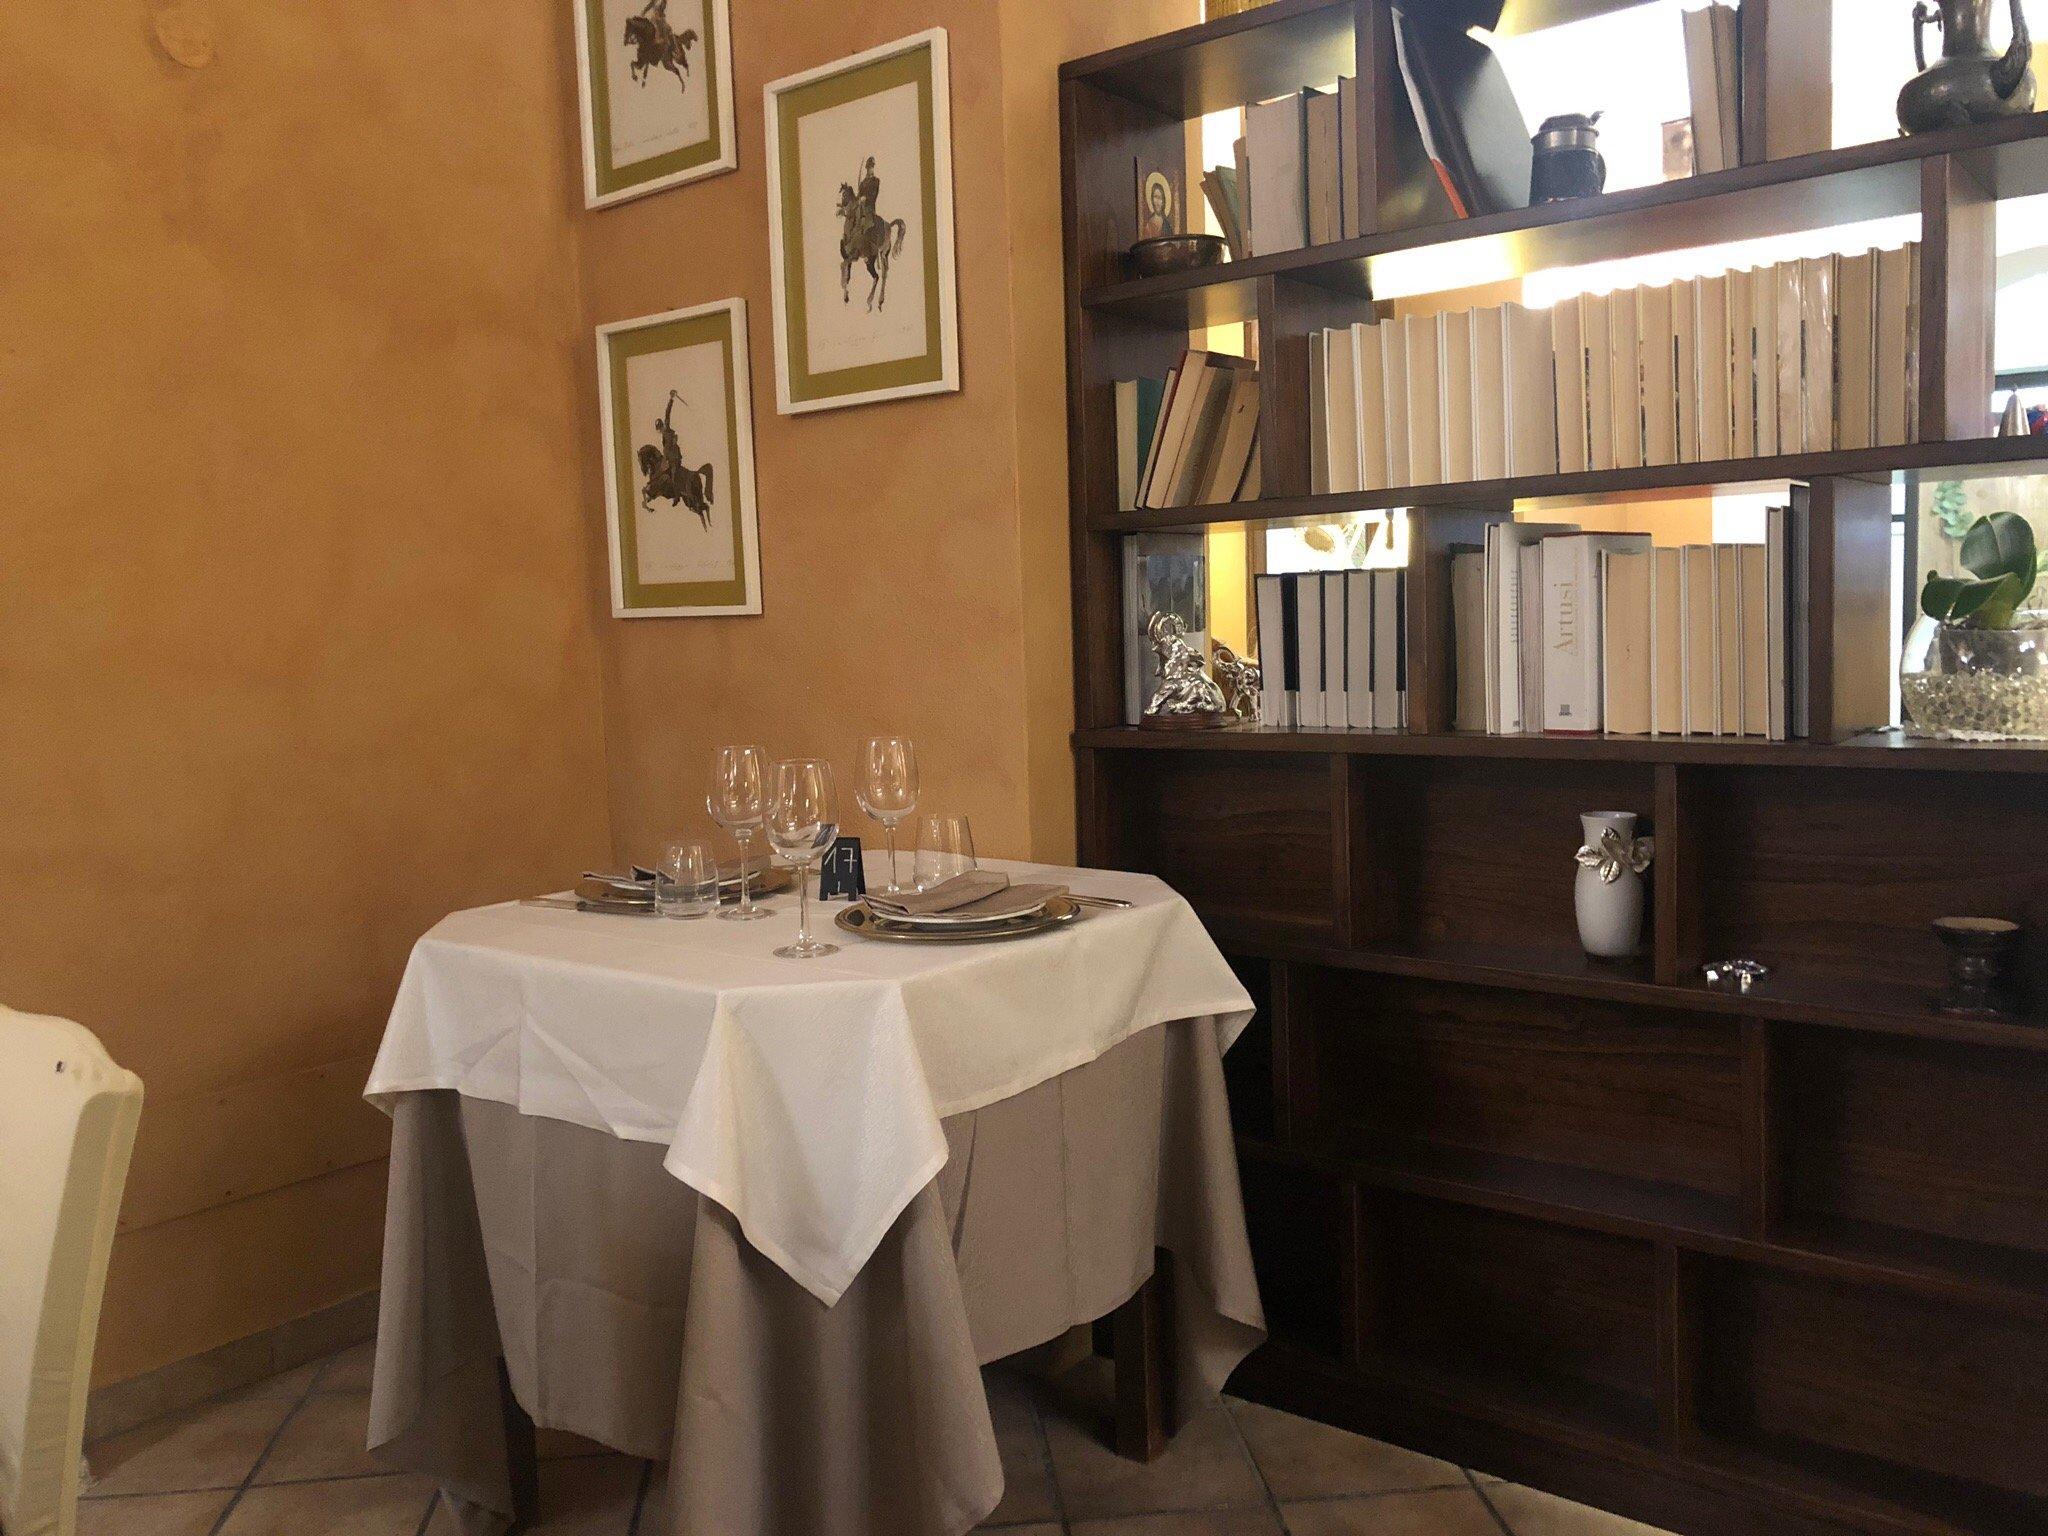 Things To Do in Lazio, Restaurants in Lazio